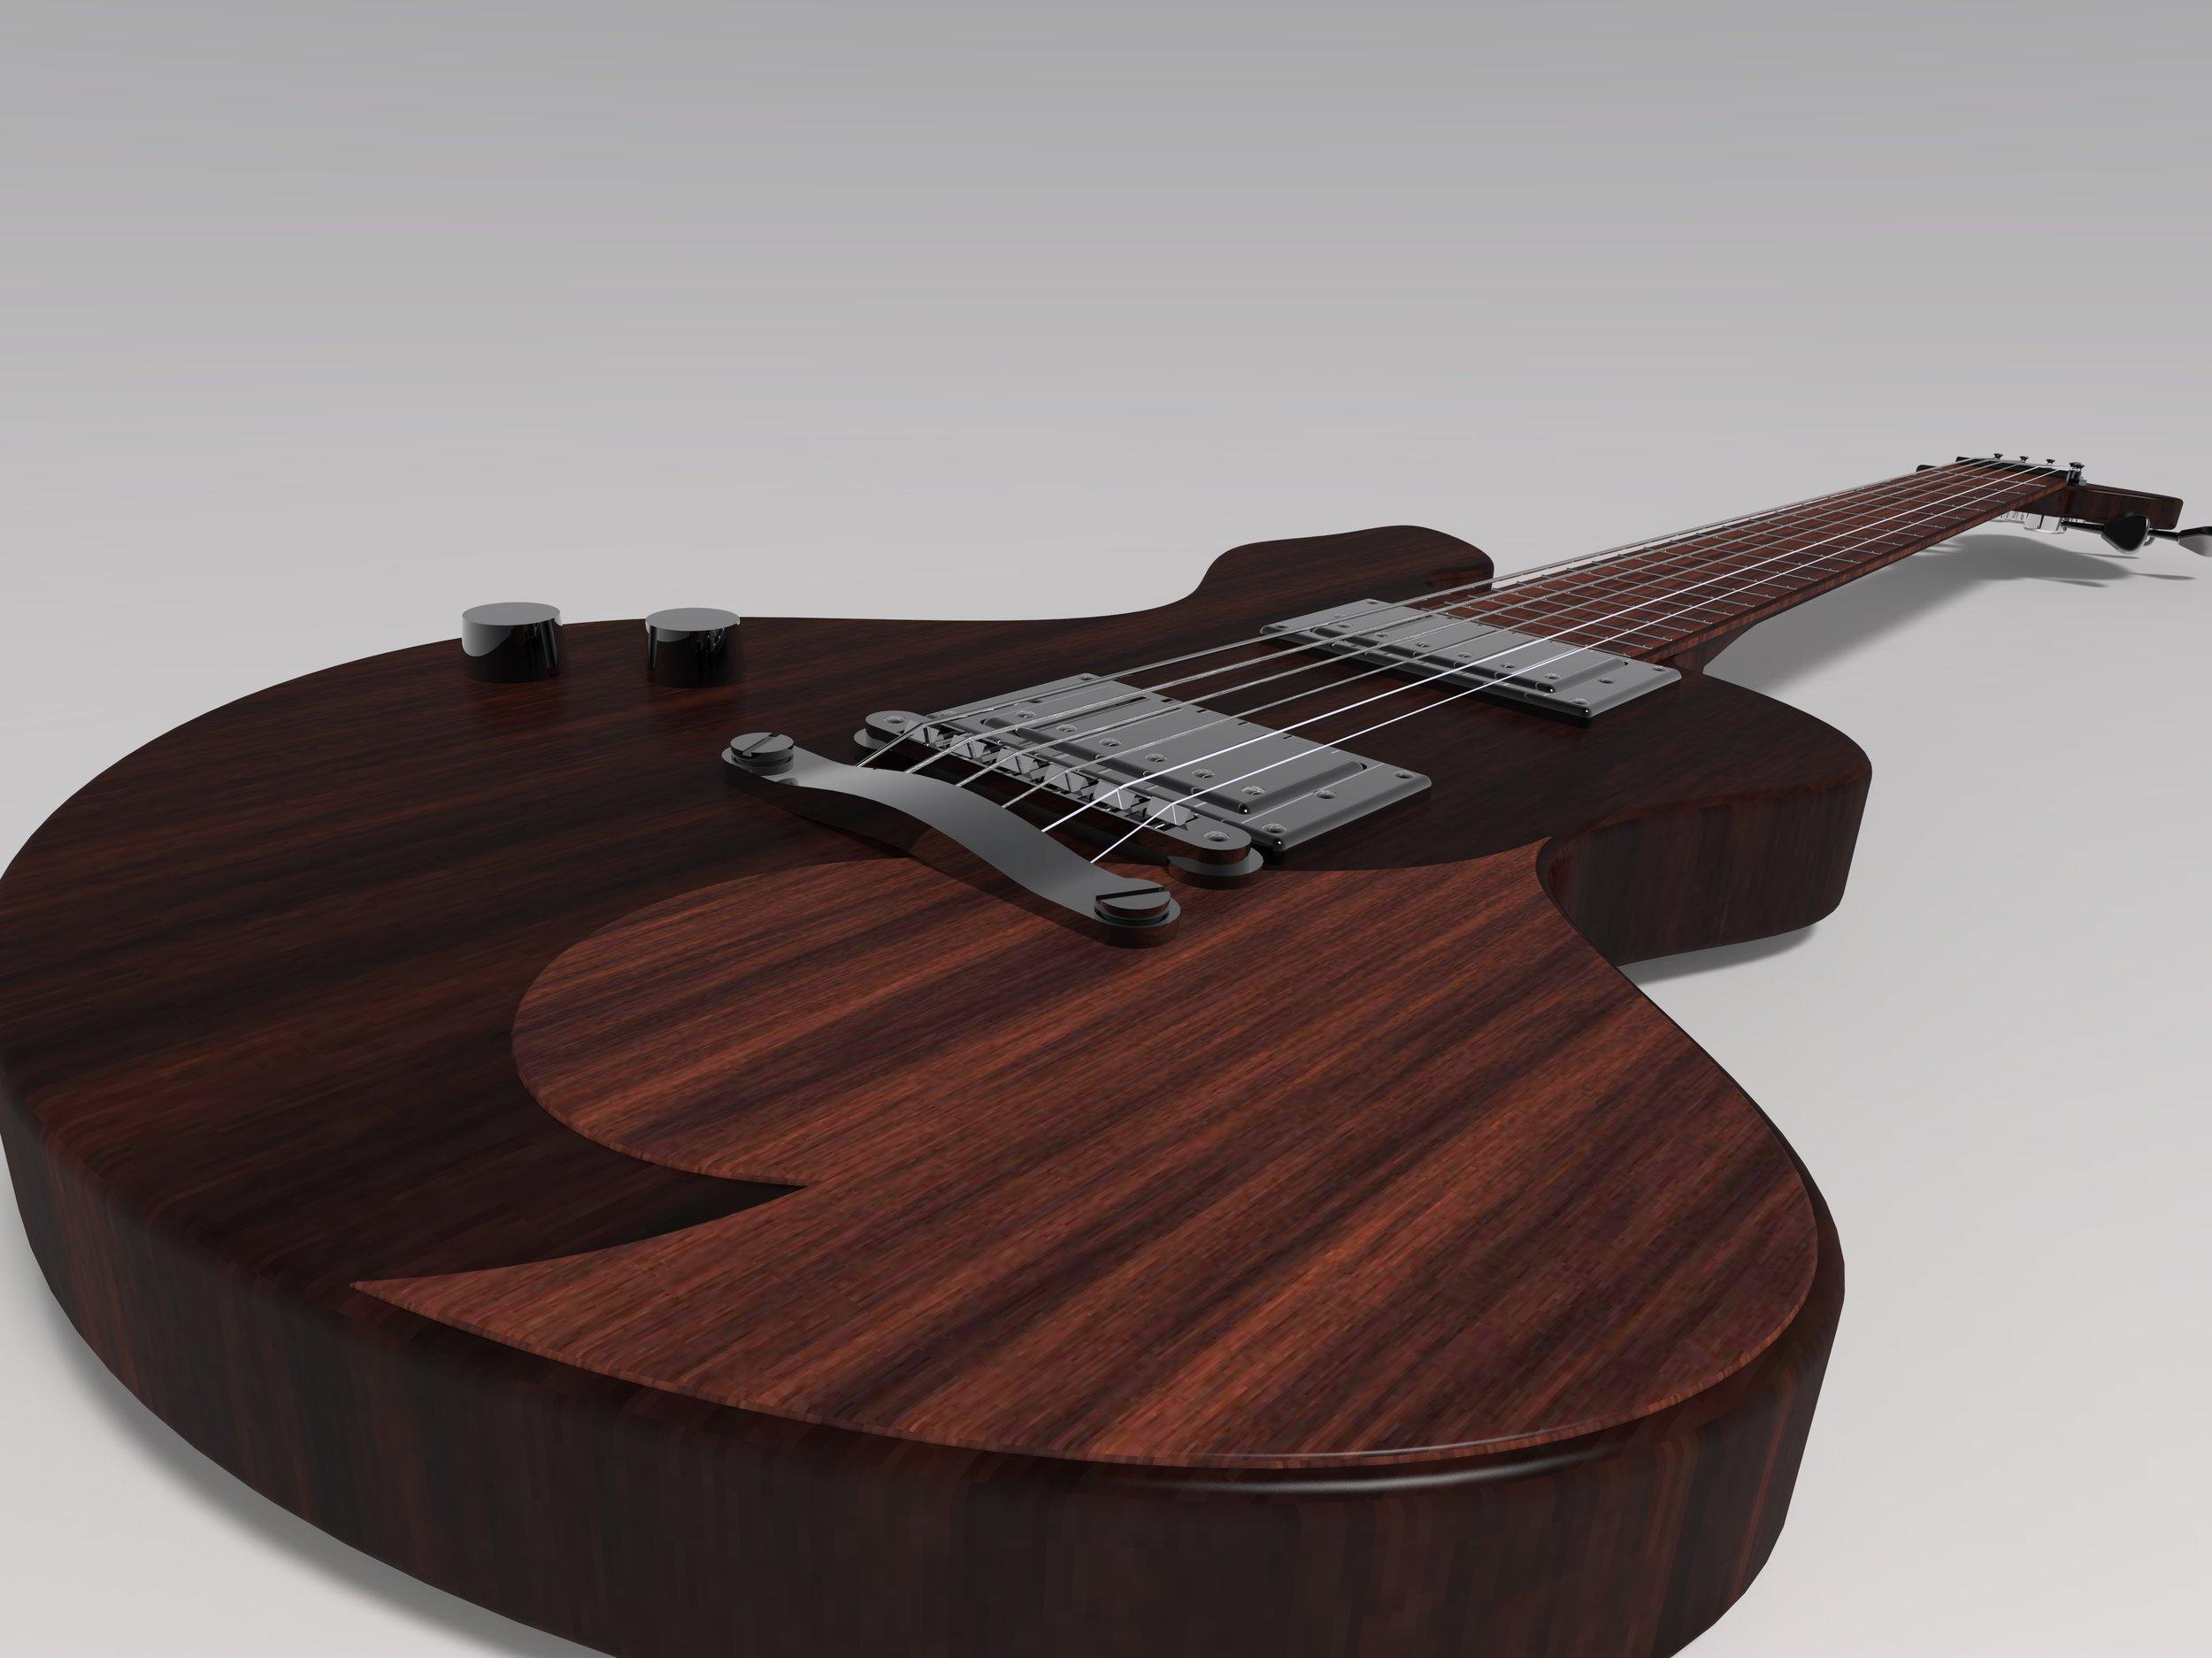 Guitar_4.258.jpg